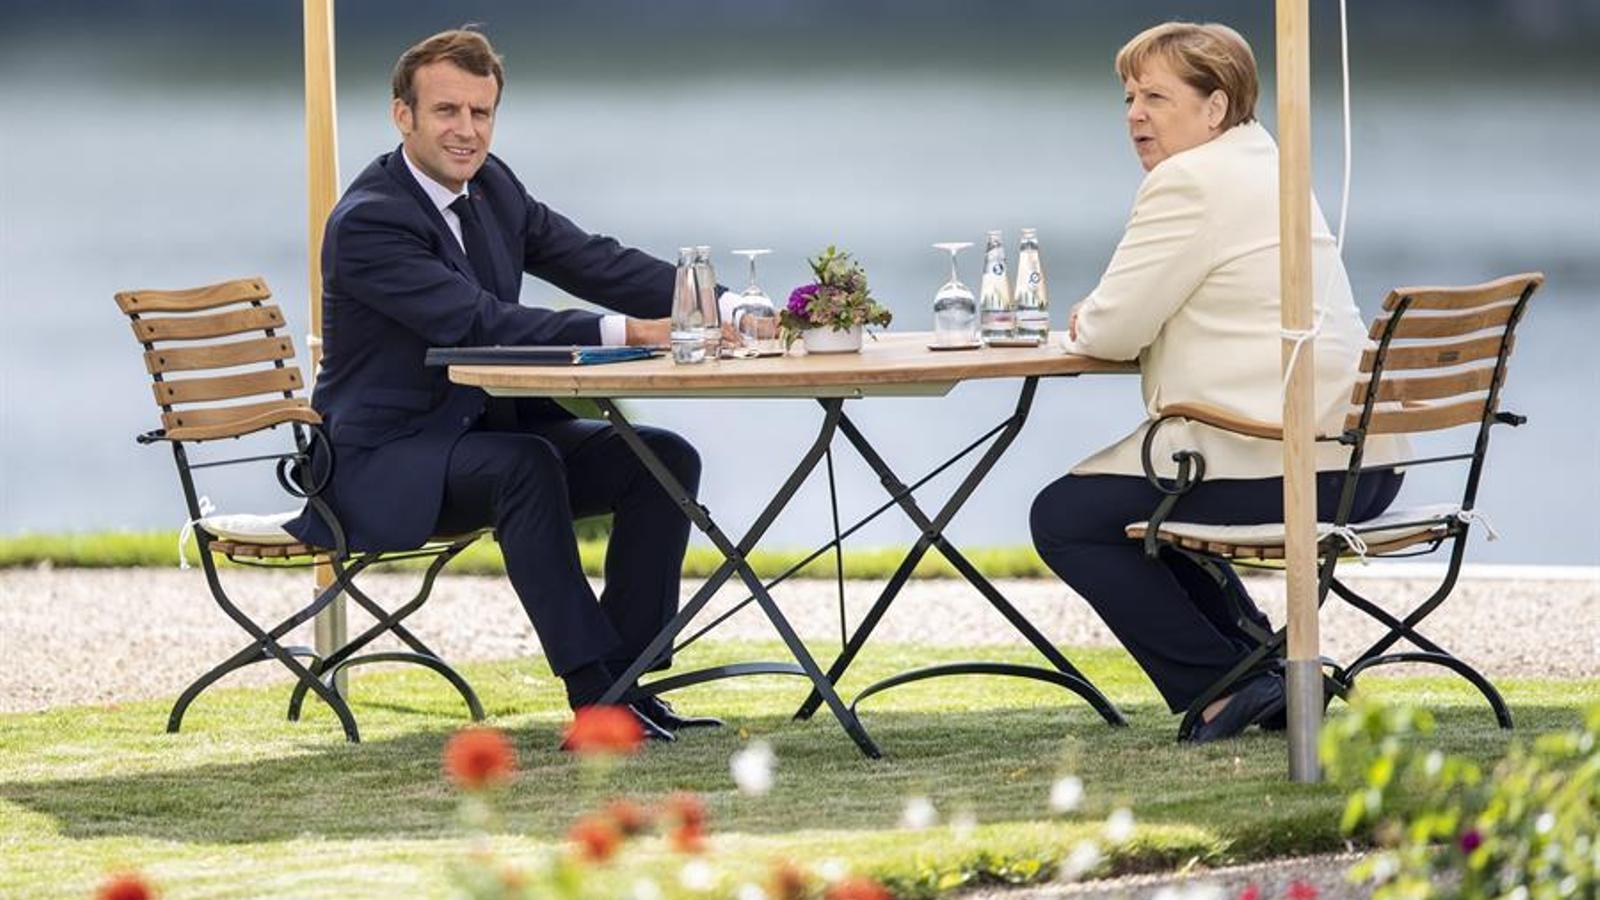 El president francès, Emmanuel Macron, i la cancellera alemanya, Angela Merkel.